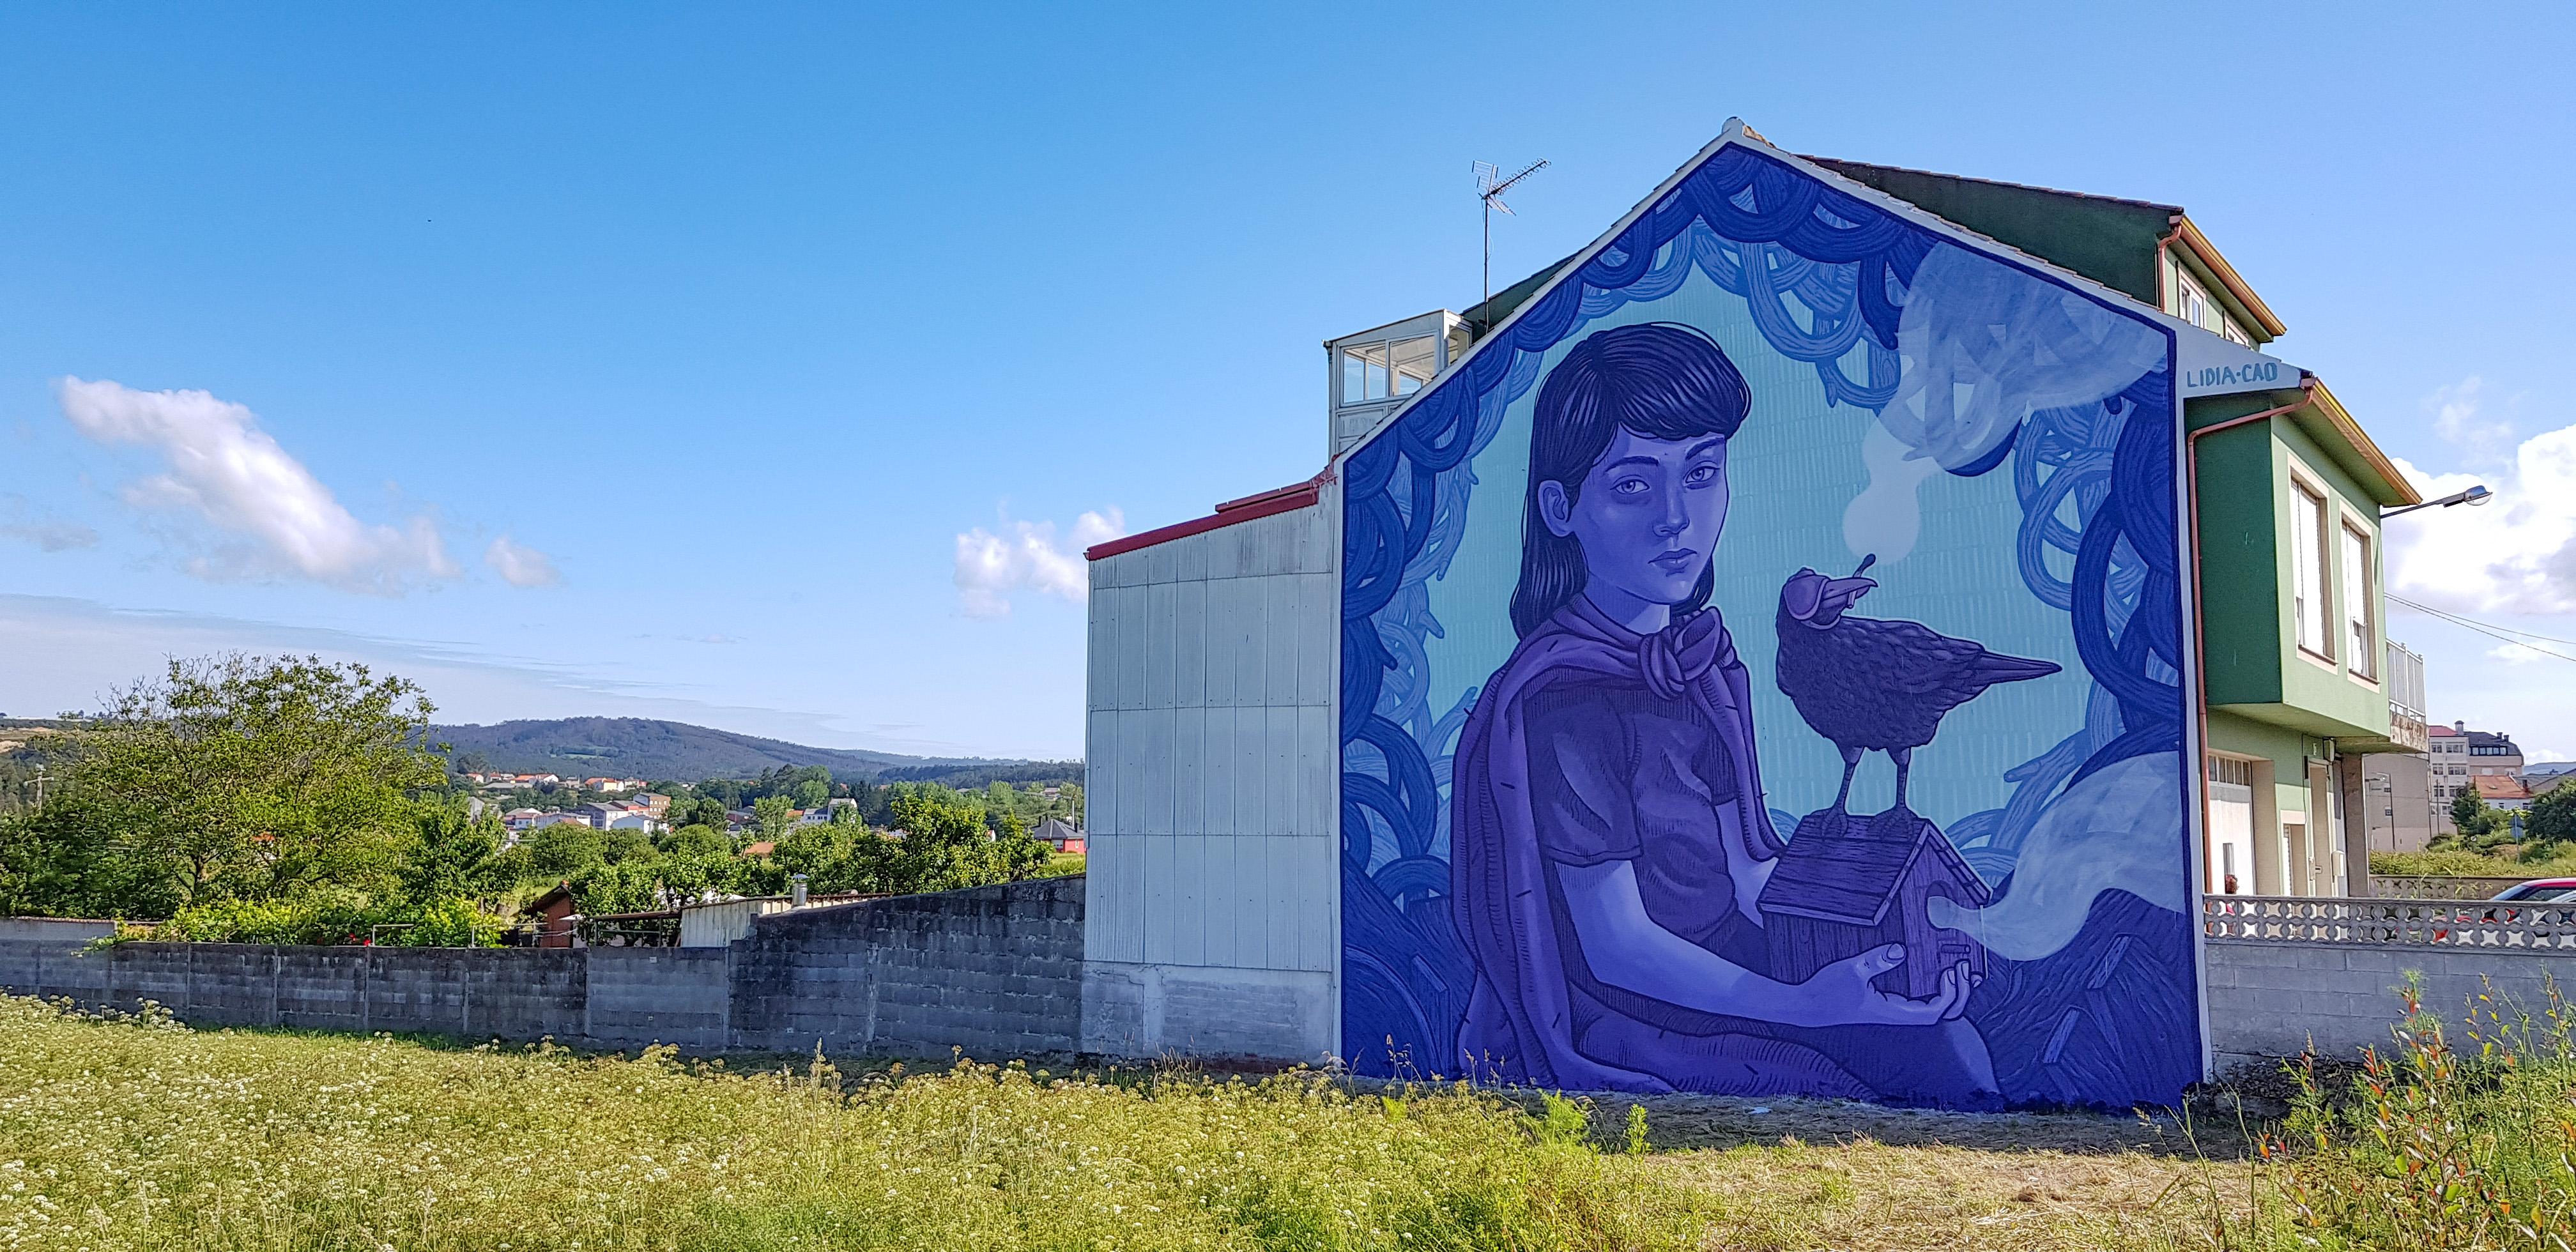 Lidia Cao - Rexenera Fest 2019